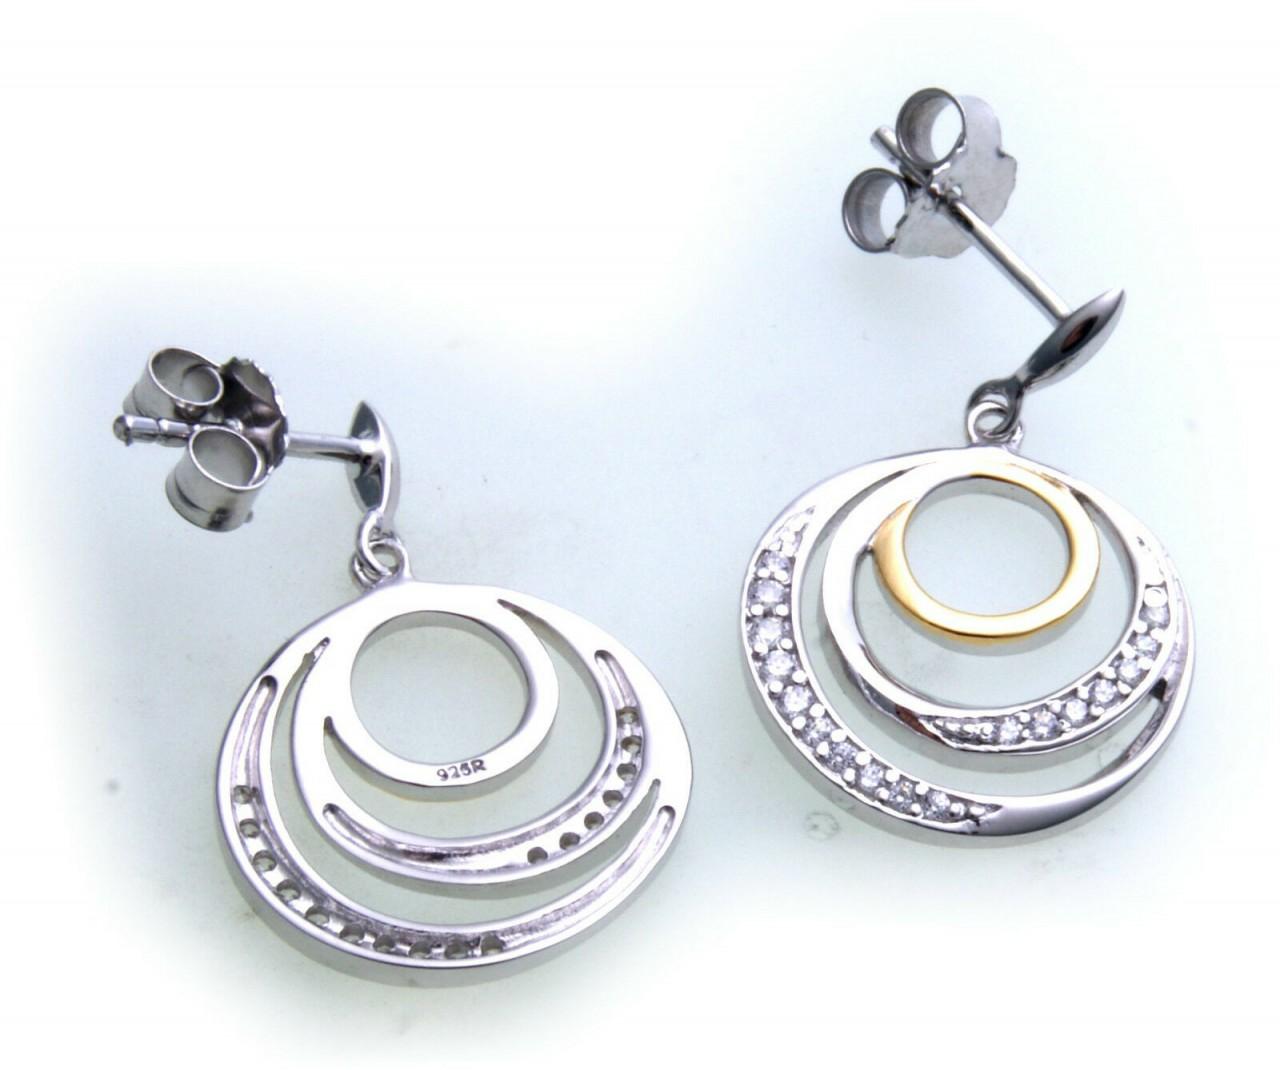 Damen Ohrringe Ohrstecker Hänger echt Silber 925 Zirkonia Sterlingsilber Bicolor